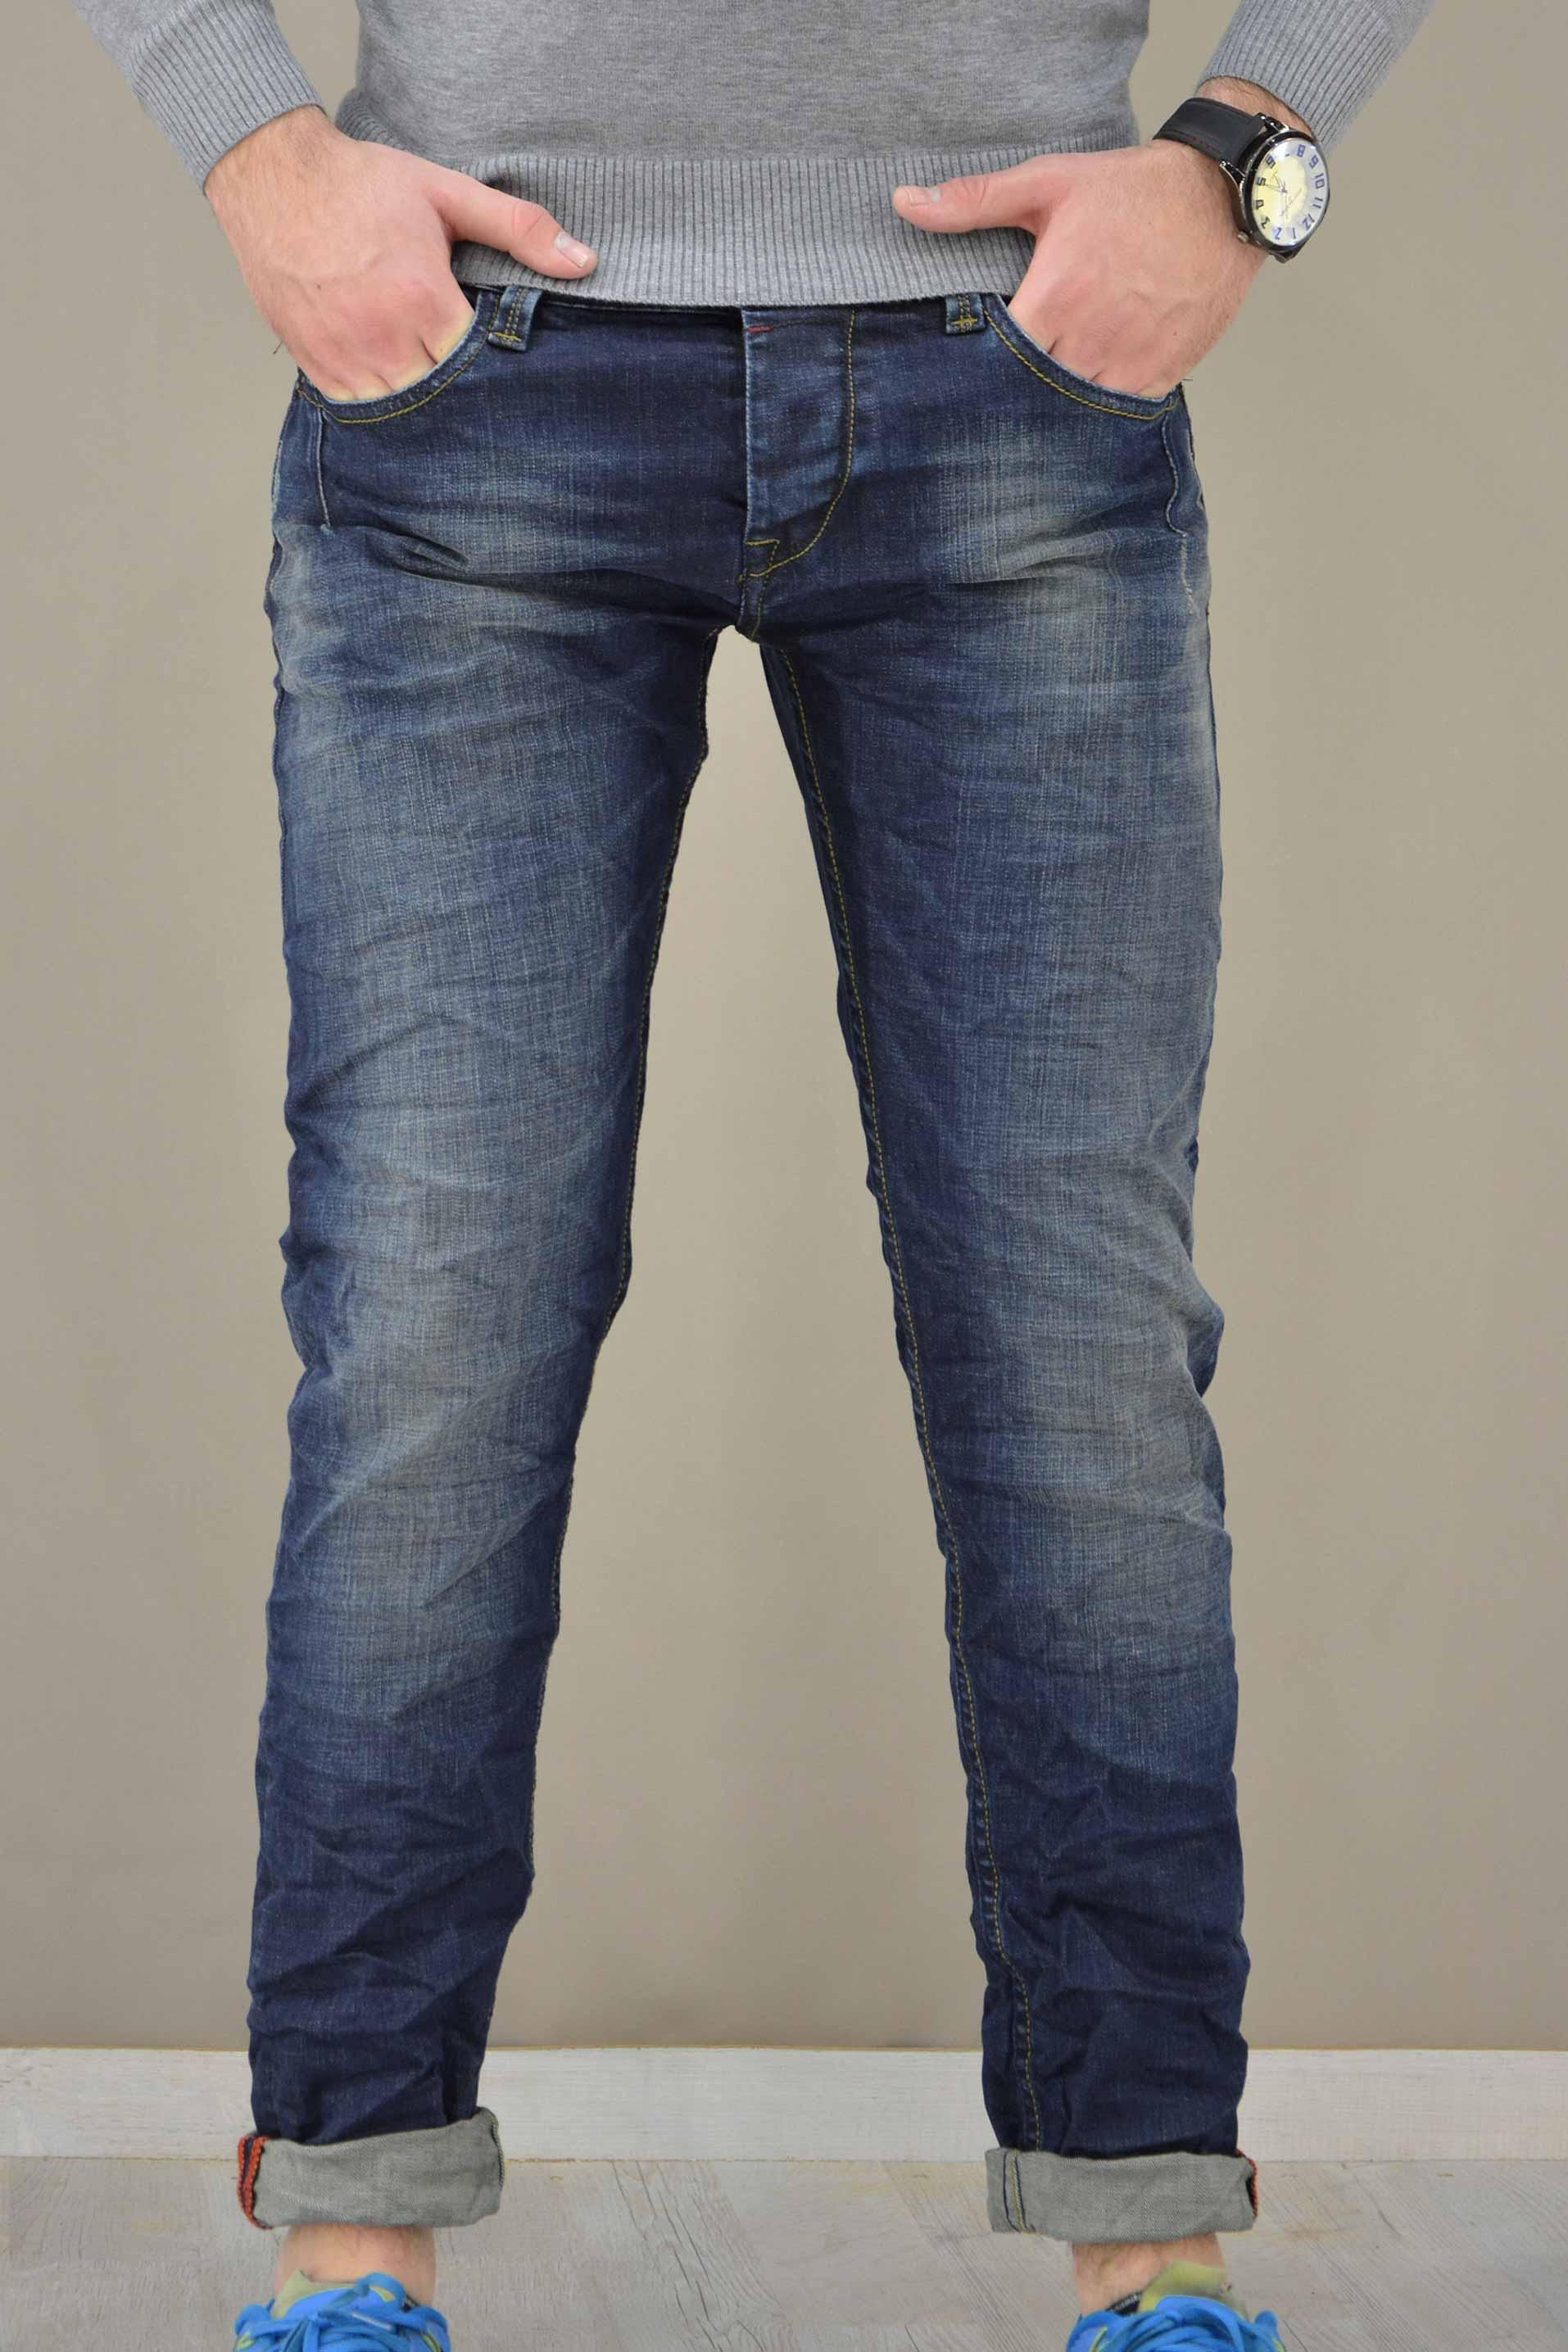 9124f8f4549a Ανδρικό παντελόνι denim PANT-5025 Παντελόνια τζίν   Jeans   Denim ...